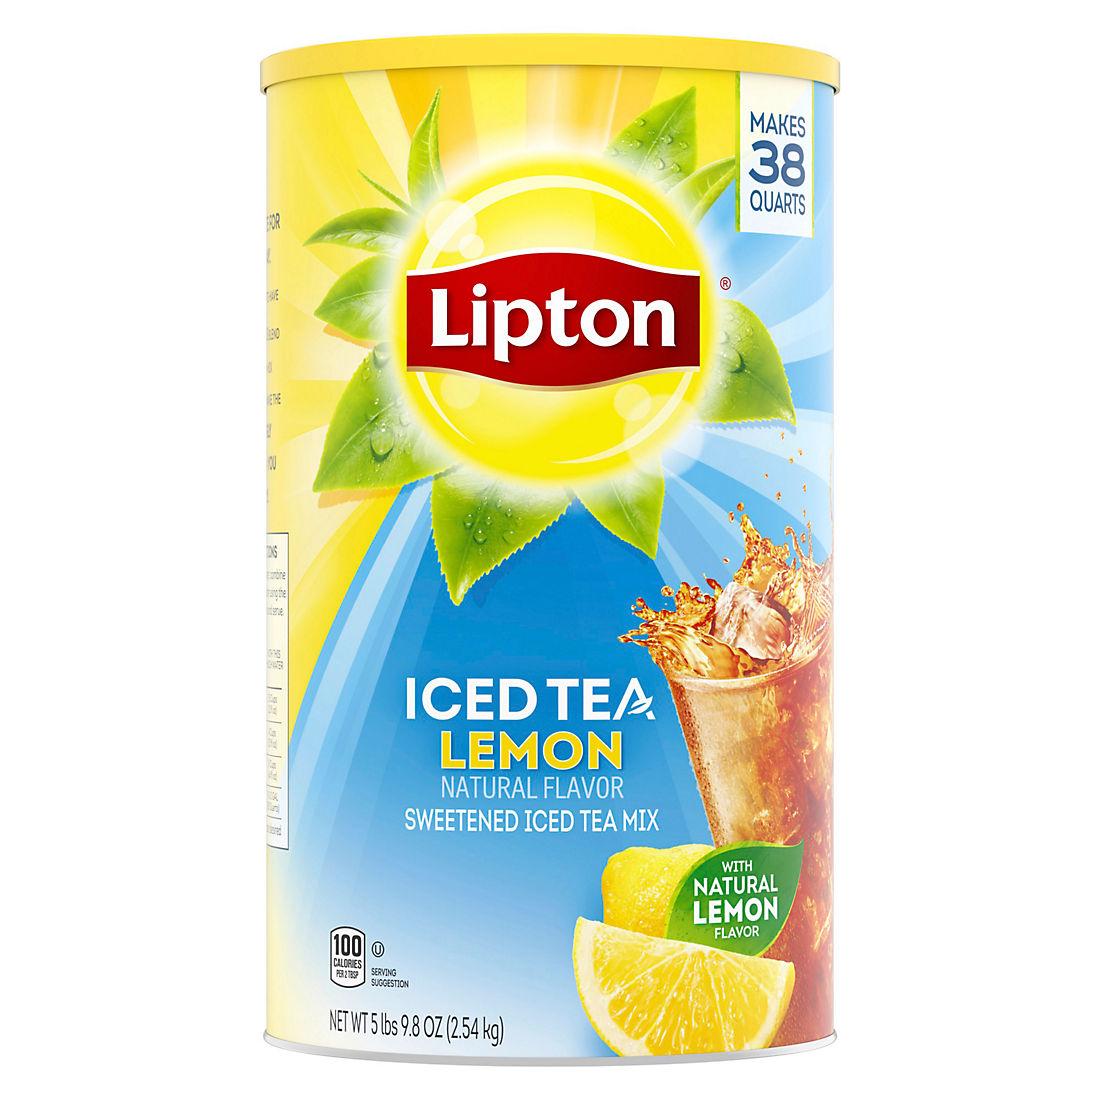 Lipton Lemon Iced Tea Mix 38 Qt Bjs Wholesale Club